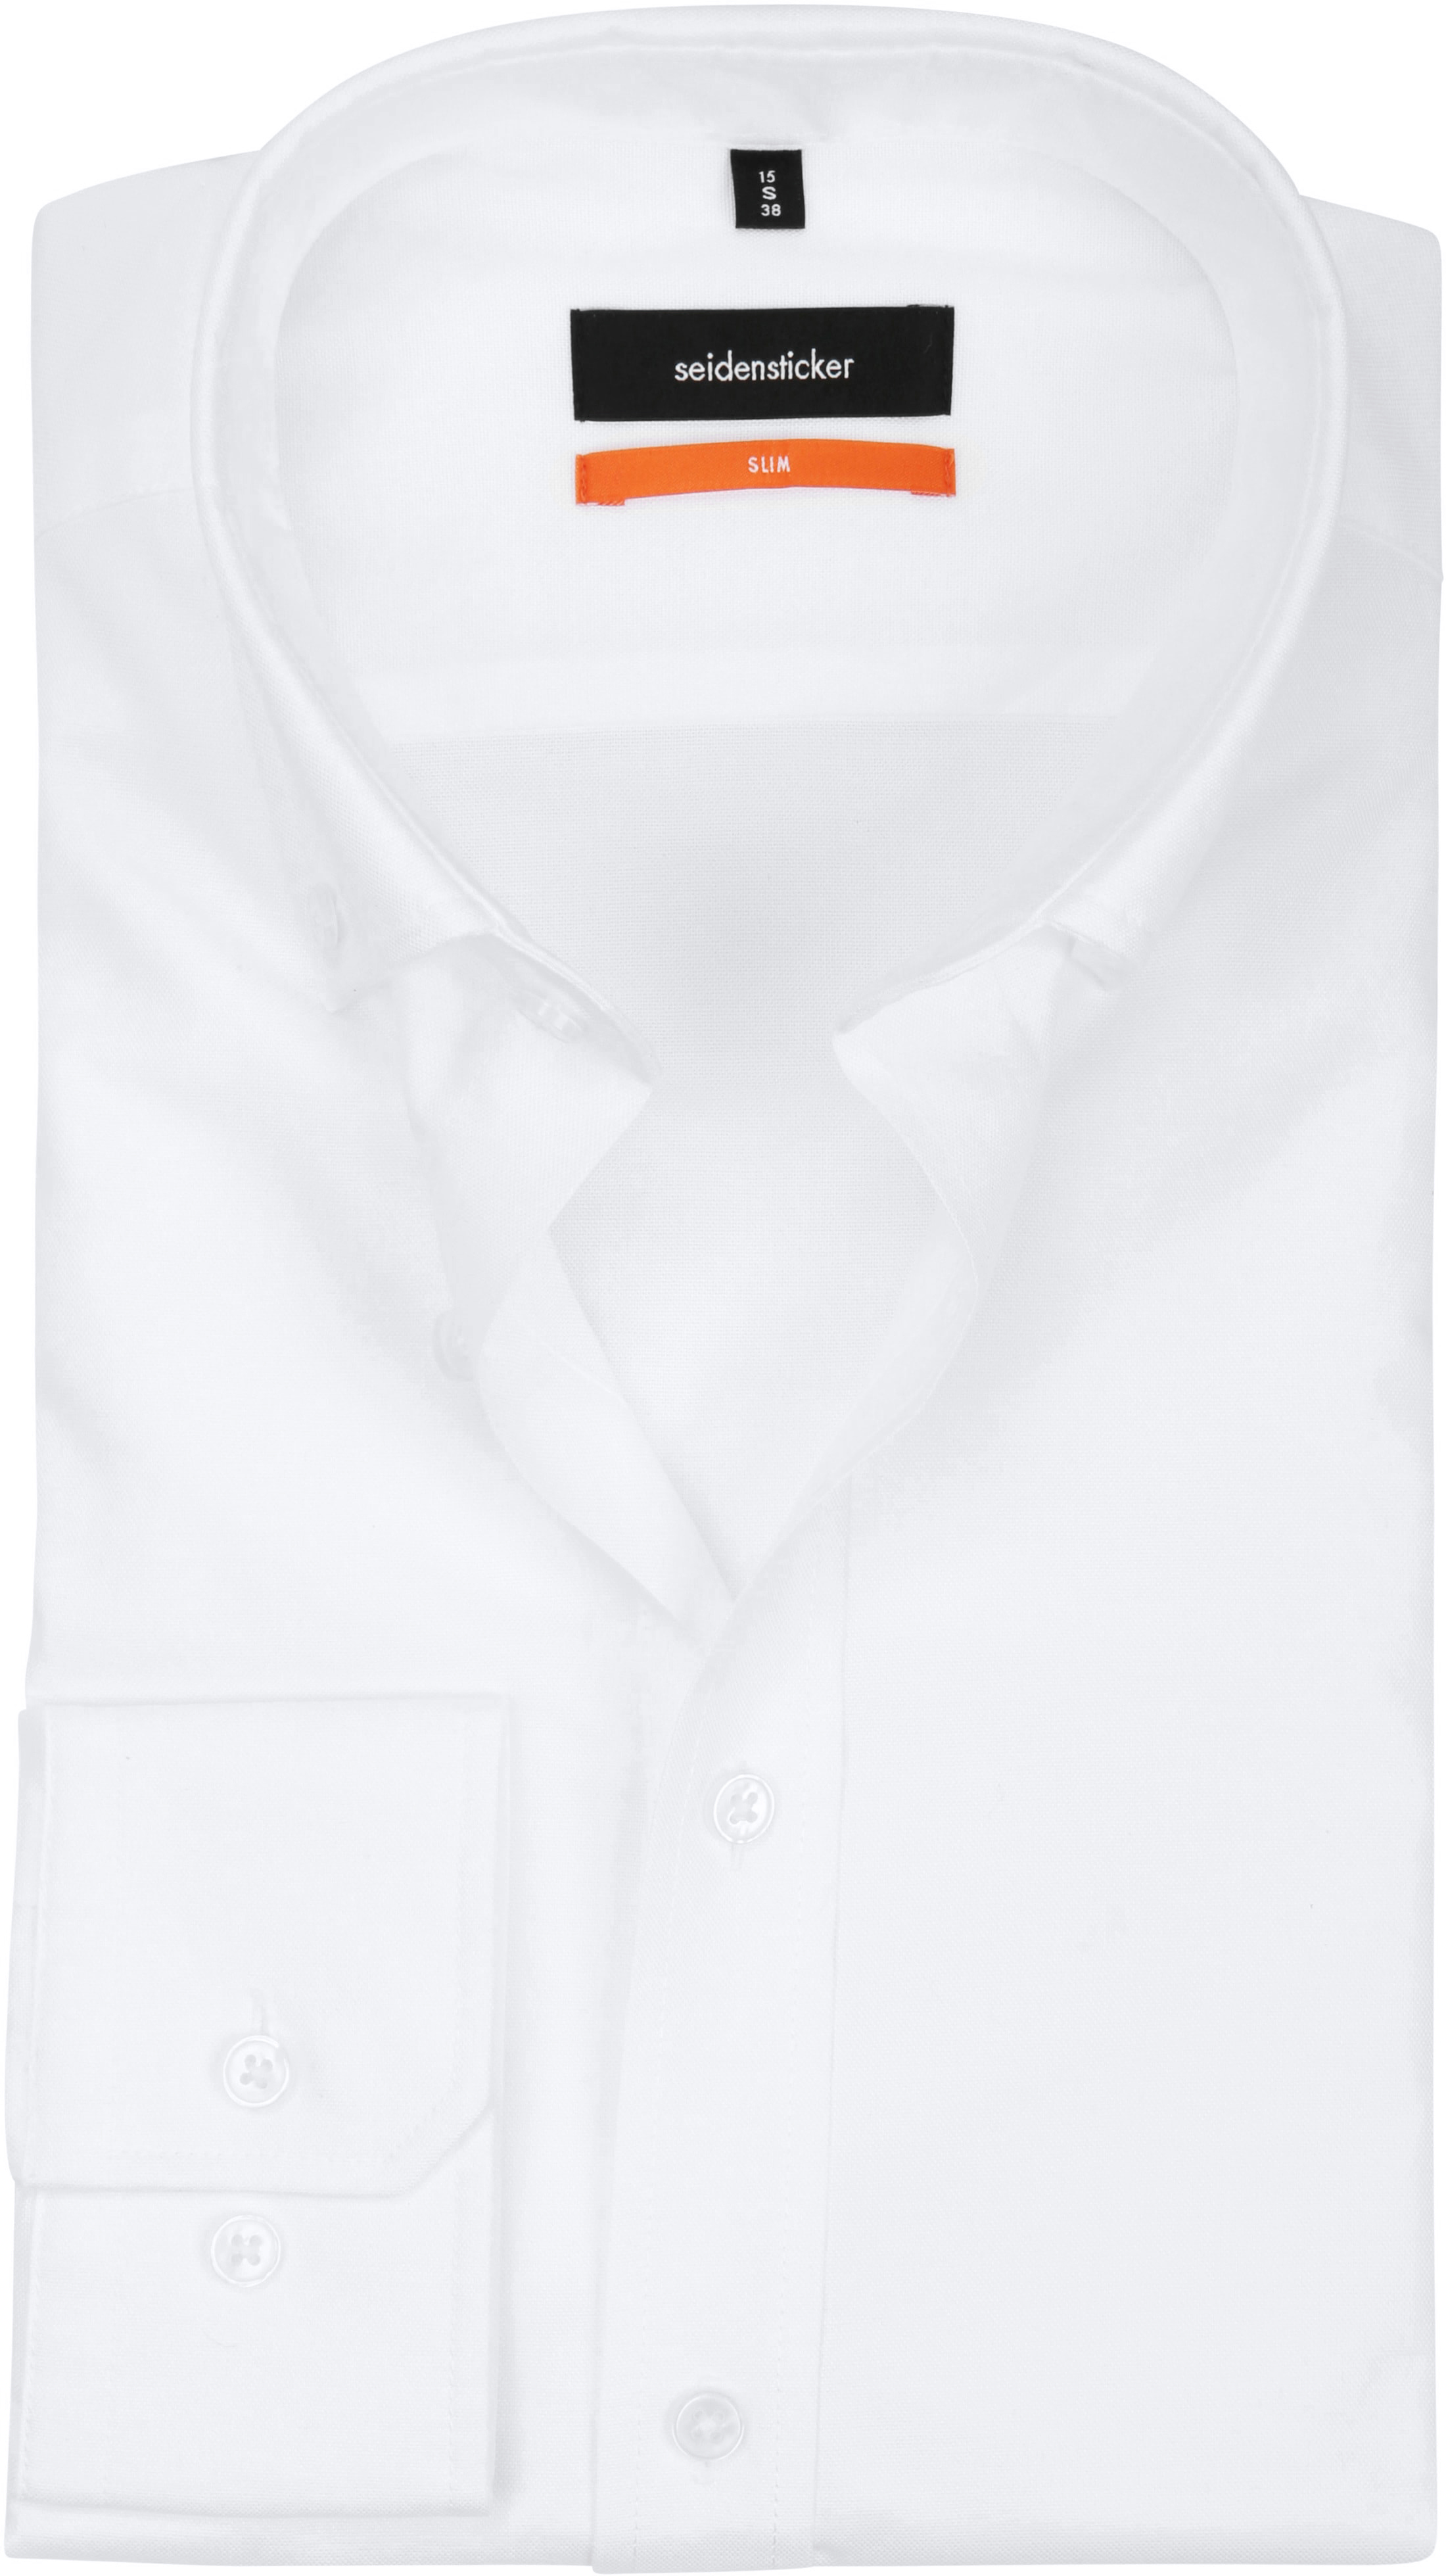 Seidensticker Shirt SF Button Down White foto 0